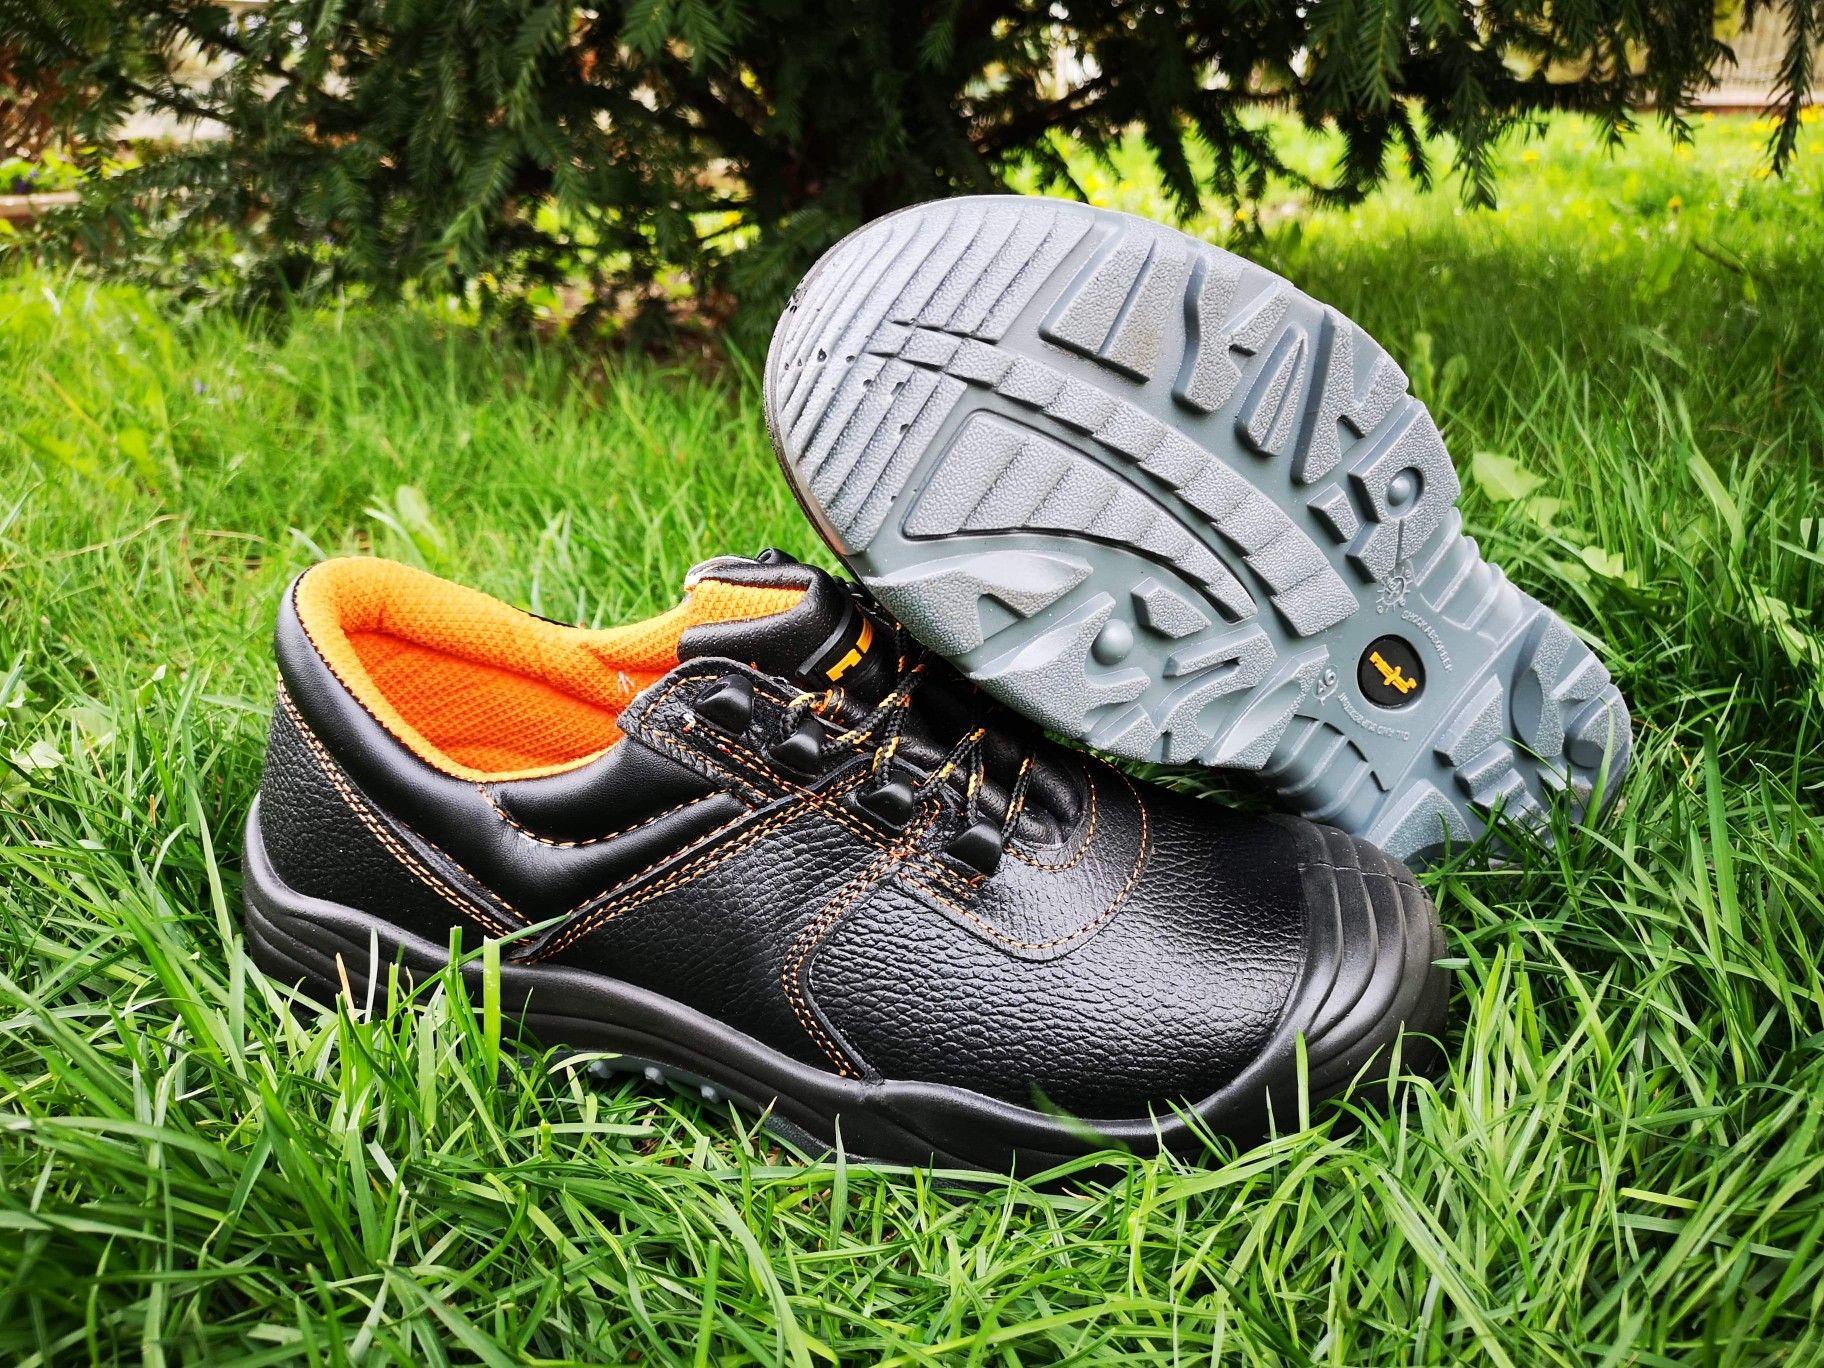 Bcs Polbuty Ochronne Work Boots Boots Work Shoes